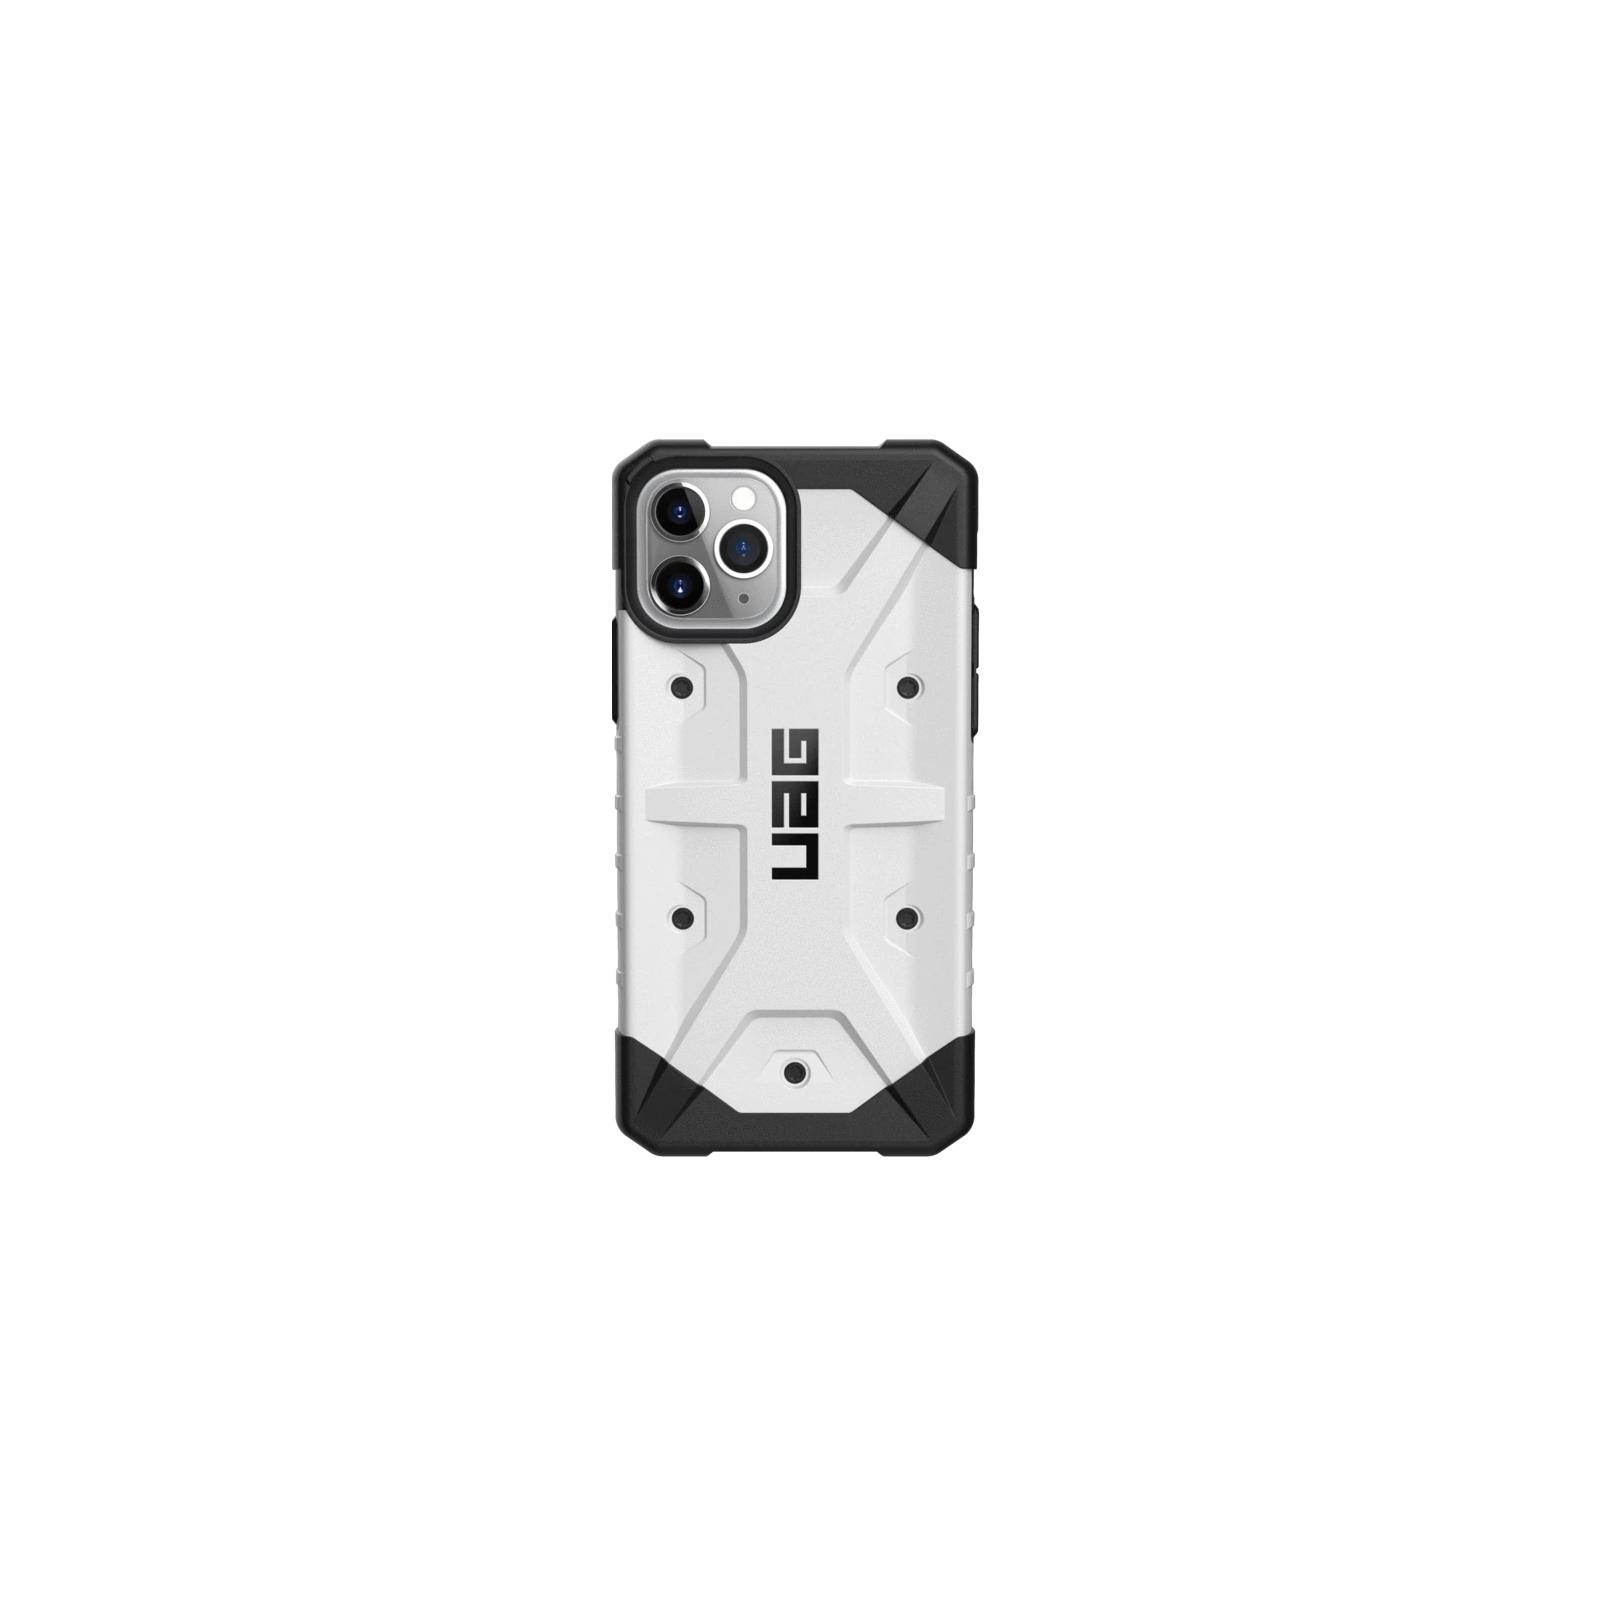 Чехол для моб. телефона Uag iPhone 11 Pro Pathfinder, White (111707114141)